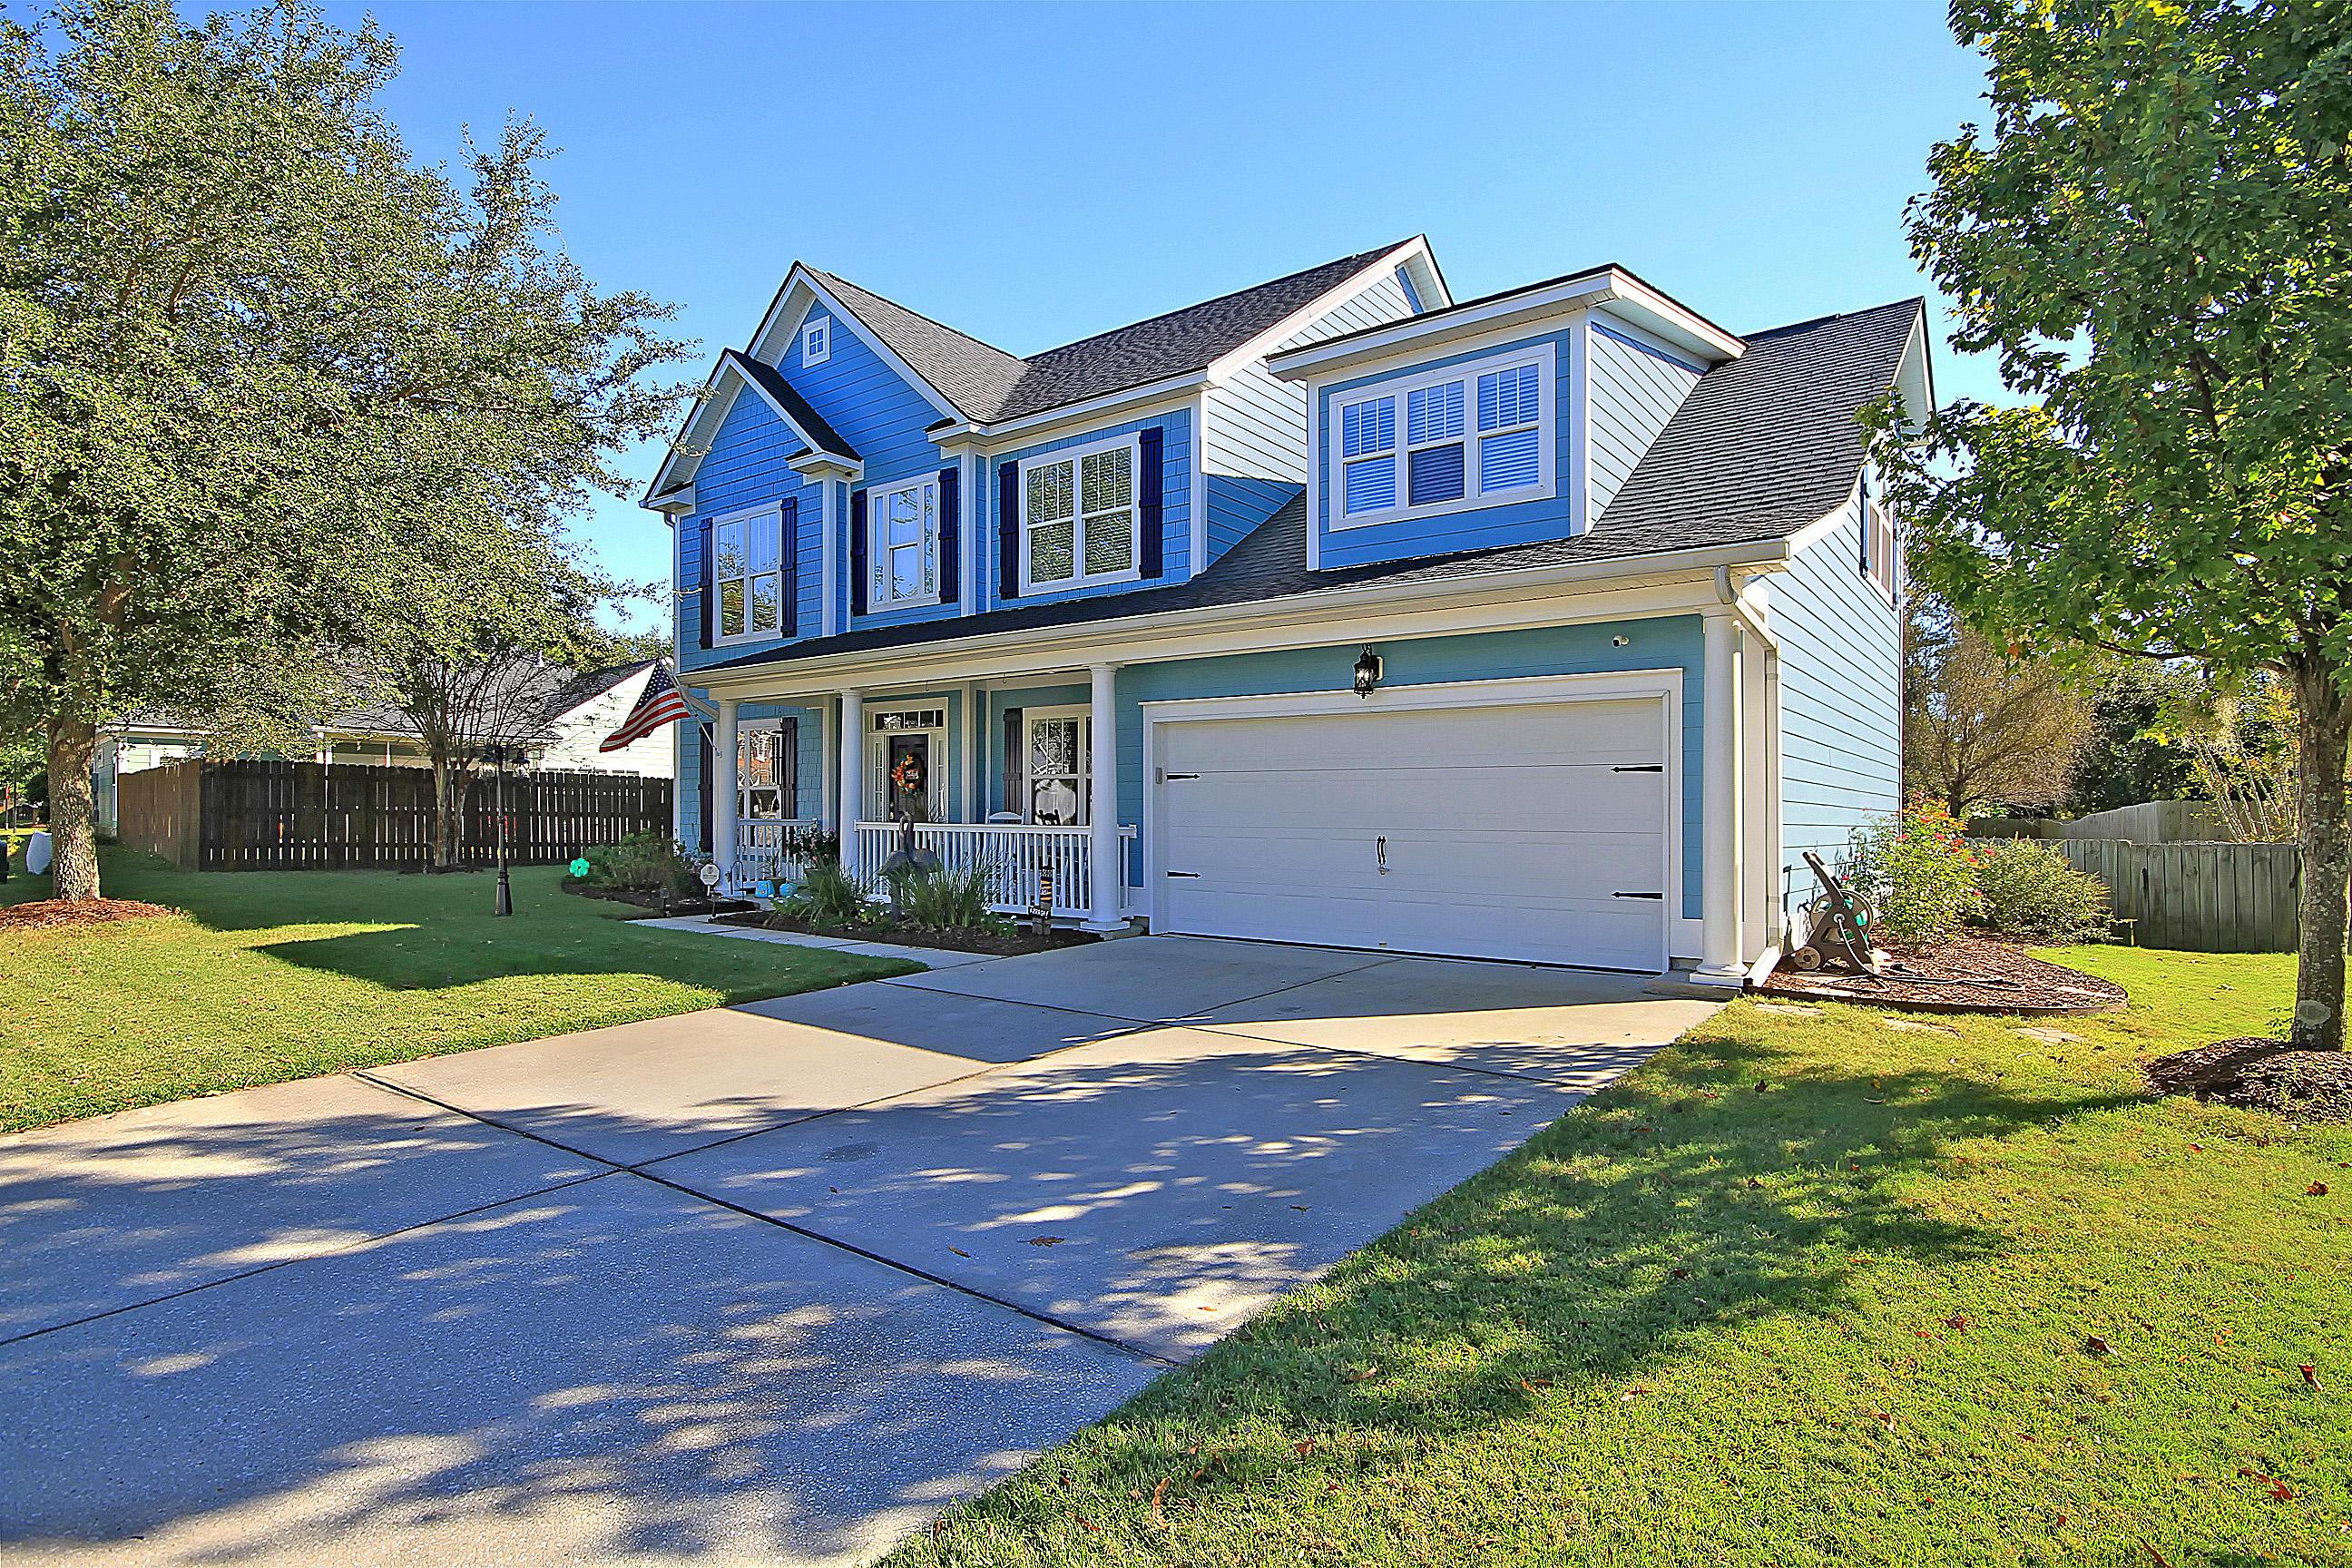 Indigo Palms Homes For Sale - 8535 Royal Palms, North Charleston, SC - 11